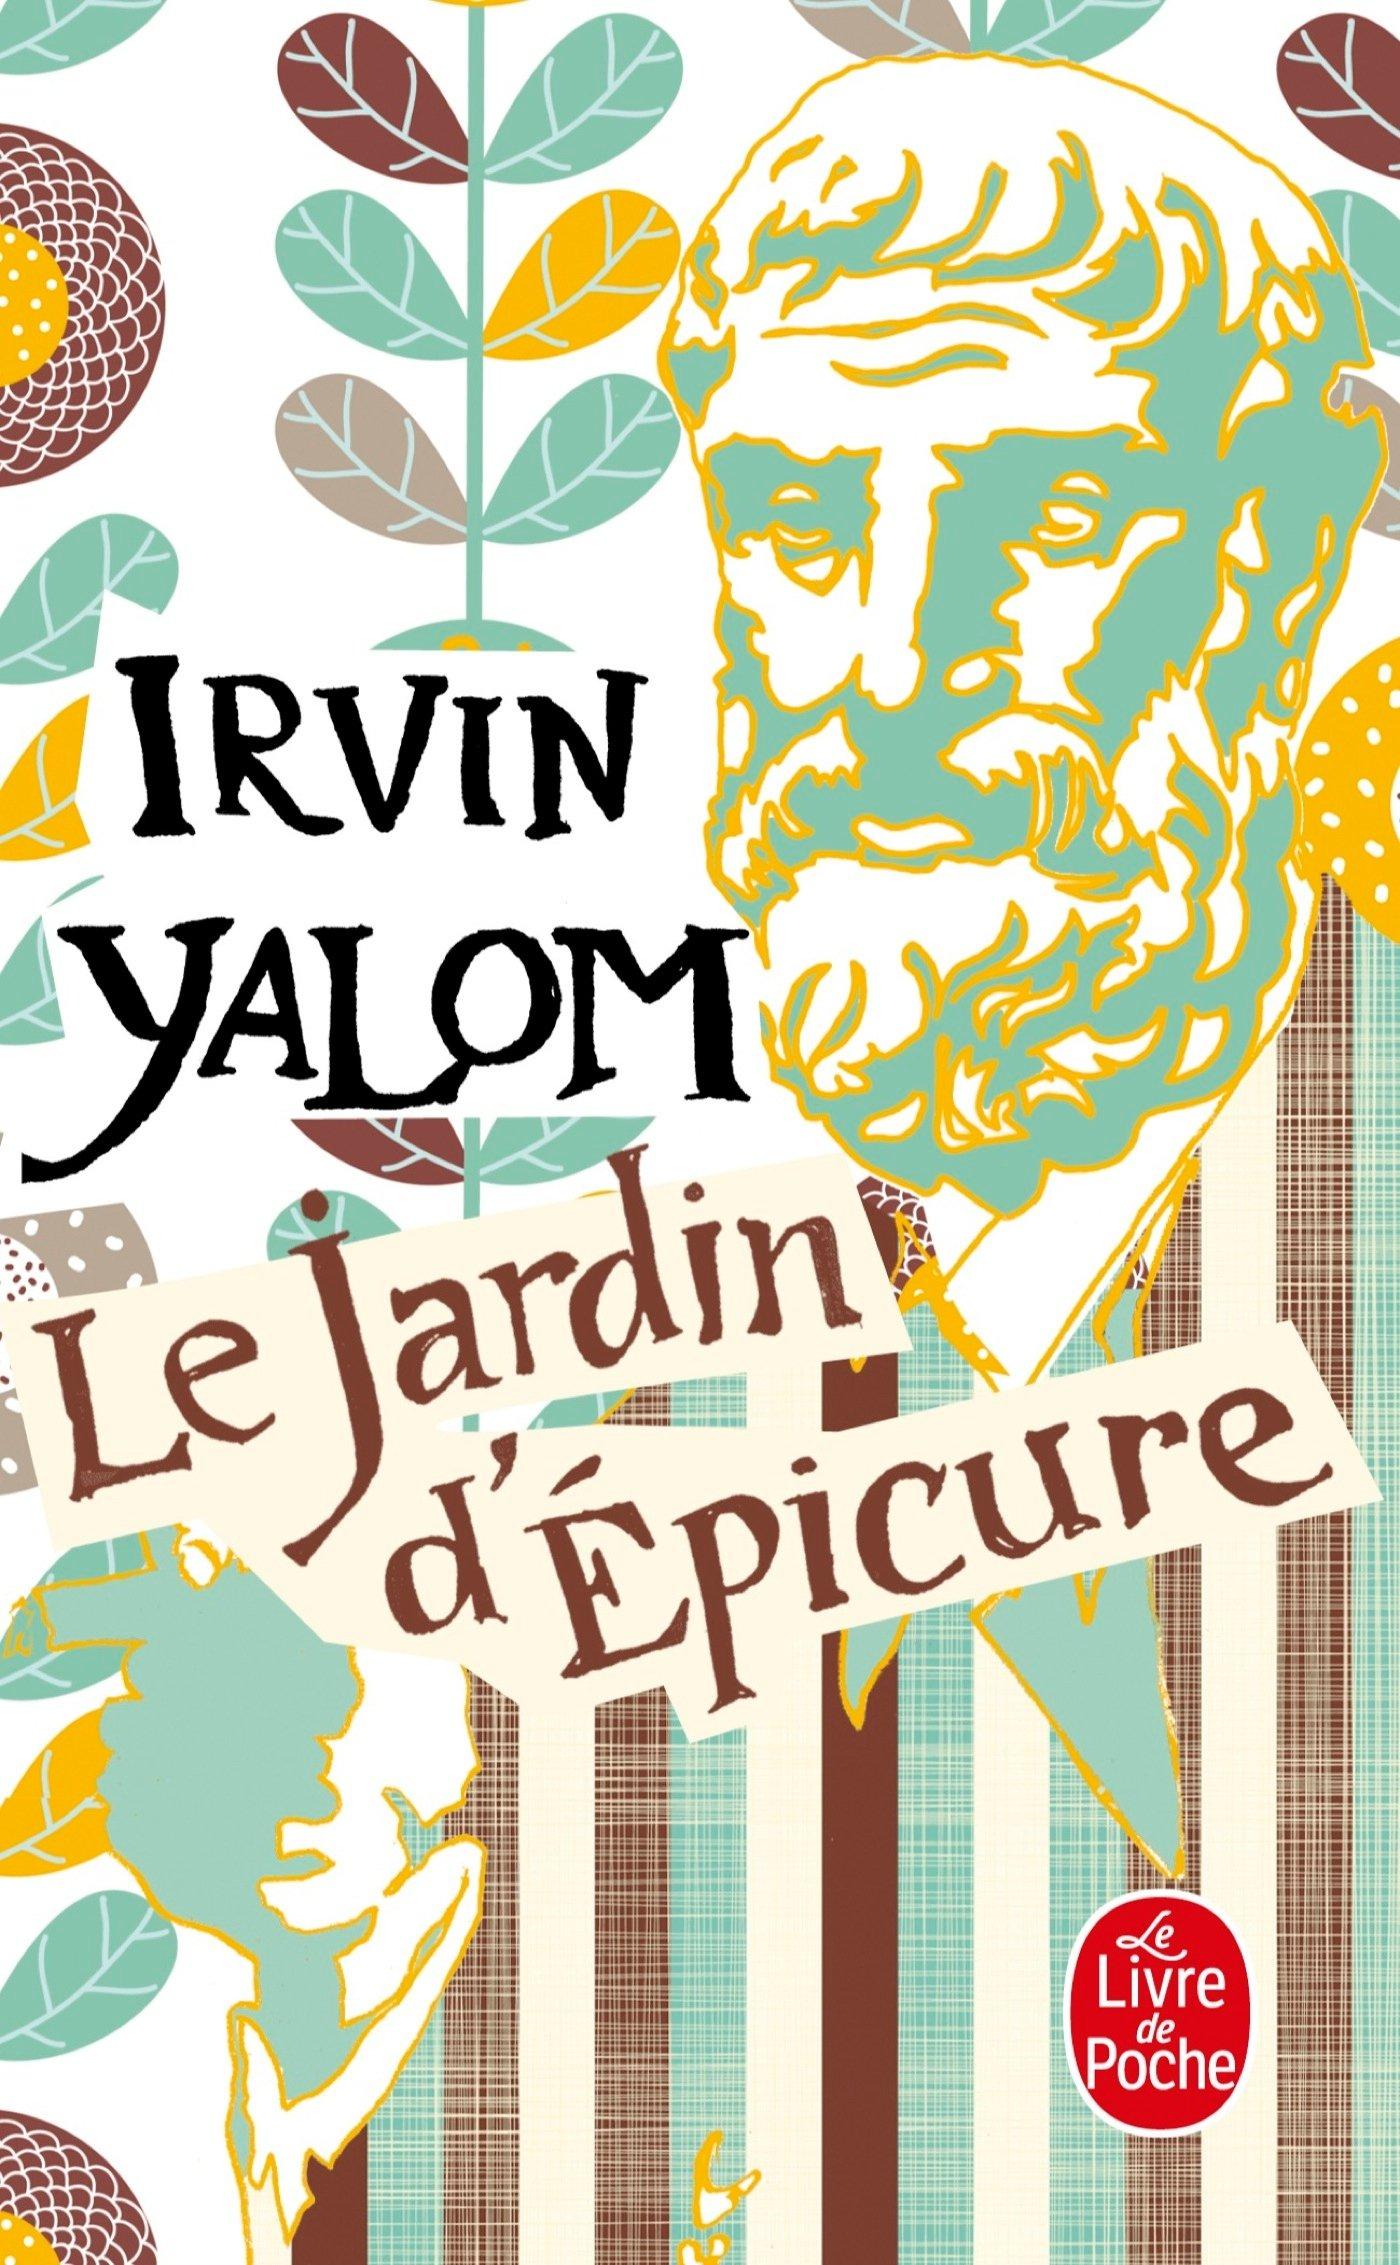 le jardin depicure french edition irvin d yalom 9782253168645 amazoncom books - Jardin D Epicure